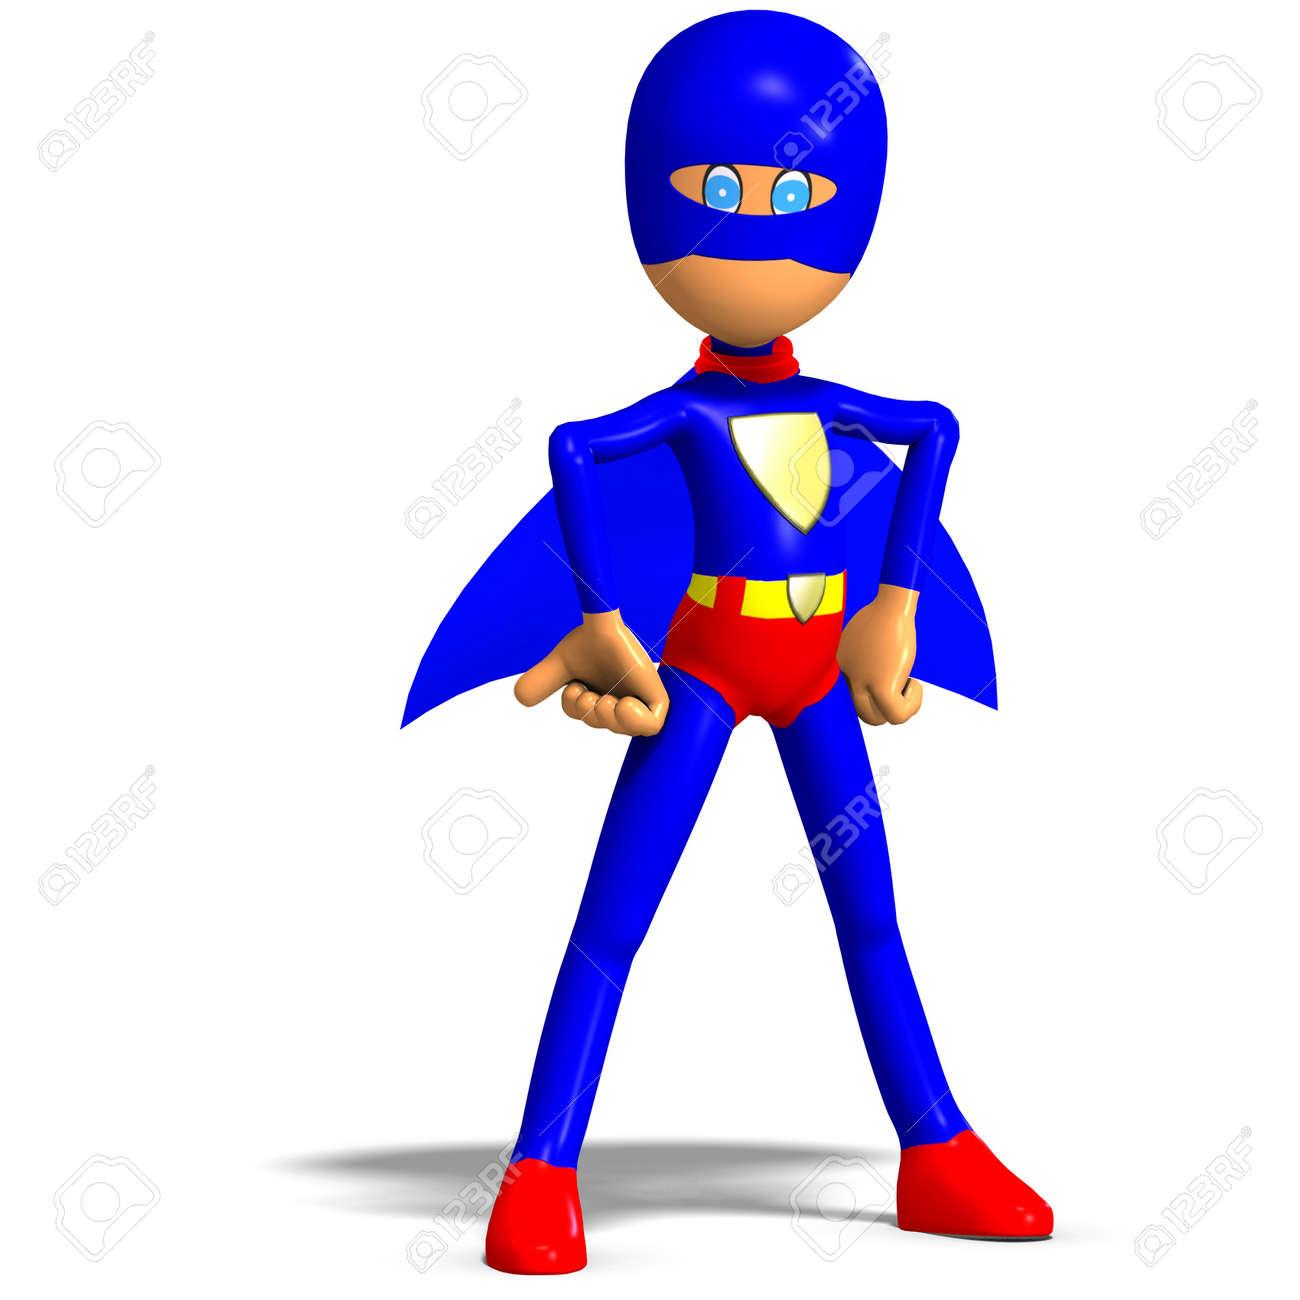 funny cartoon  hero. 3D rendering Stock Photo - 9068931